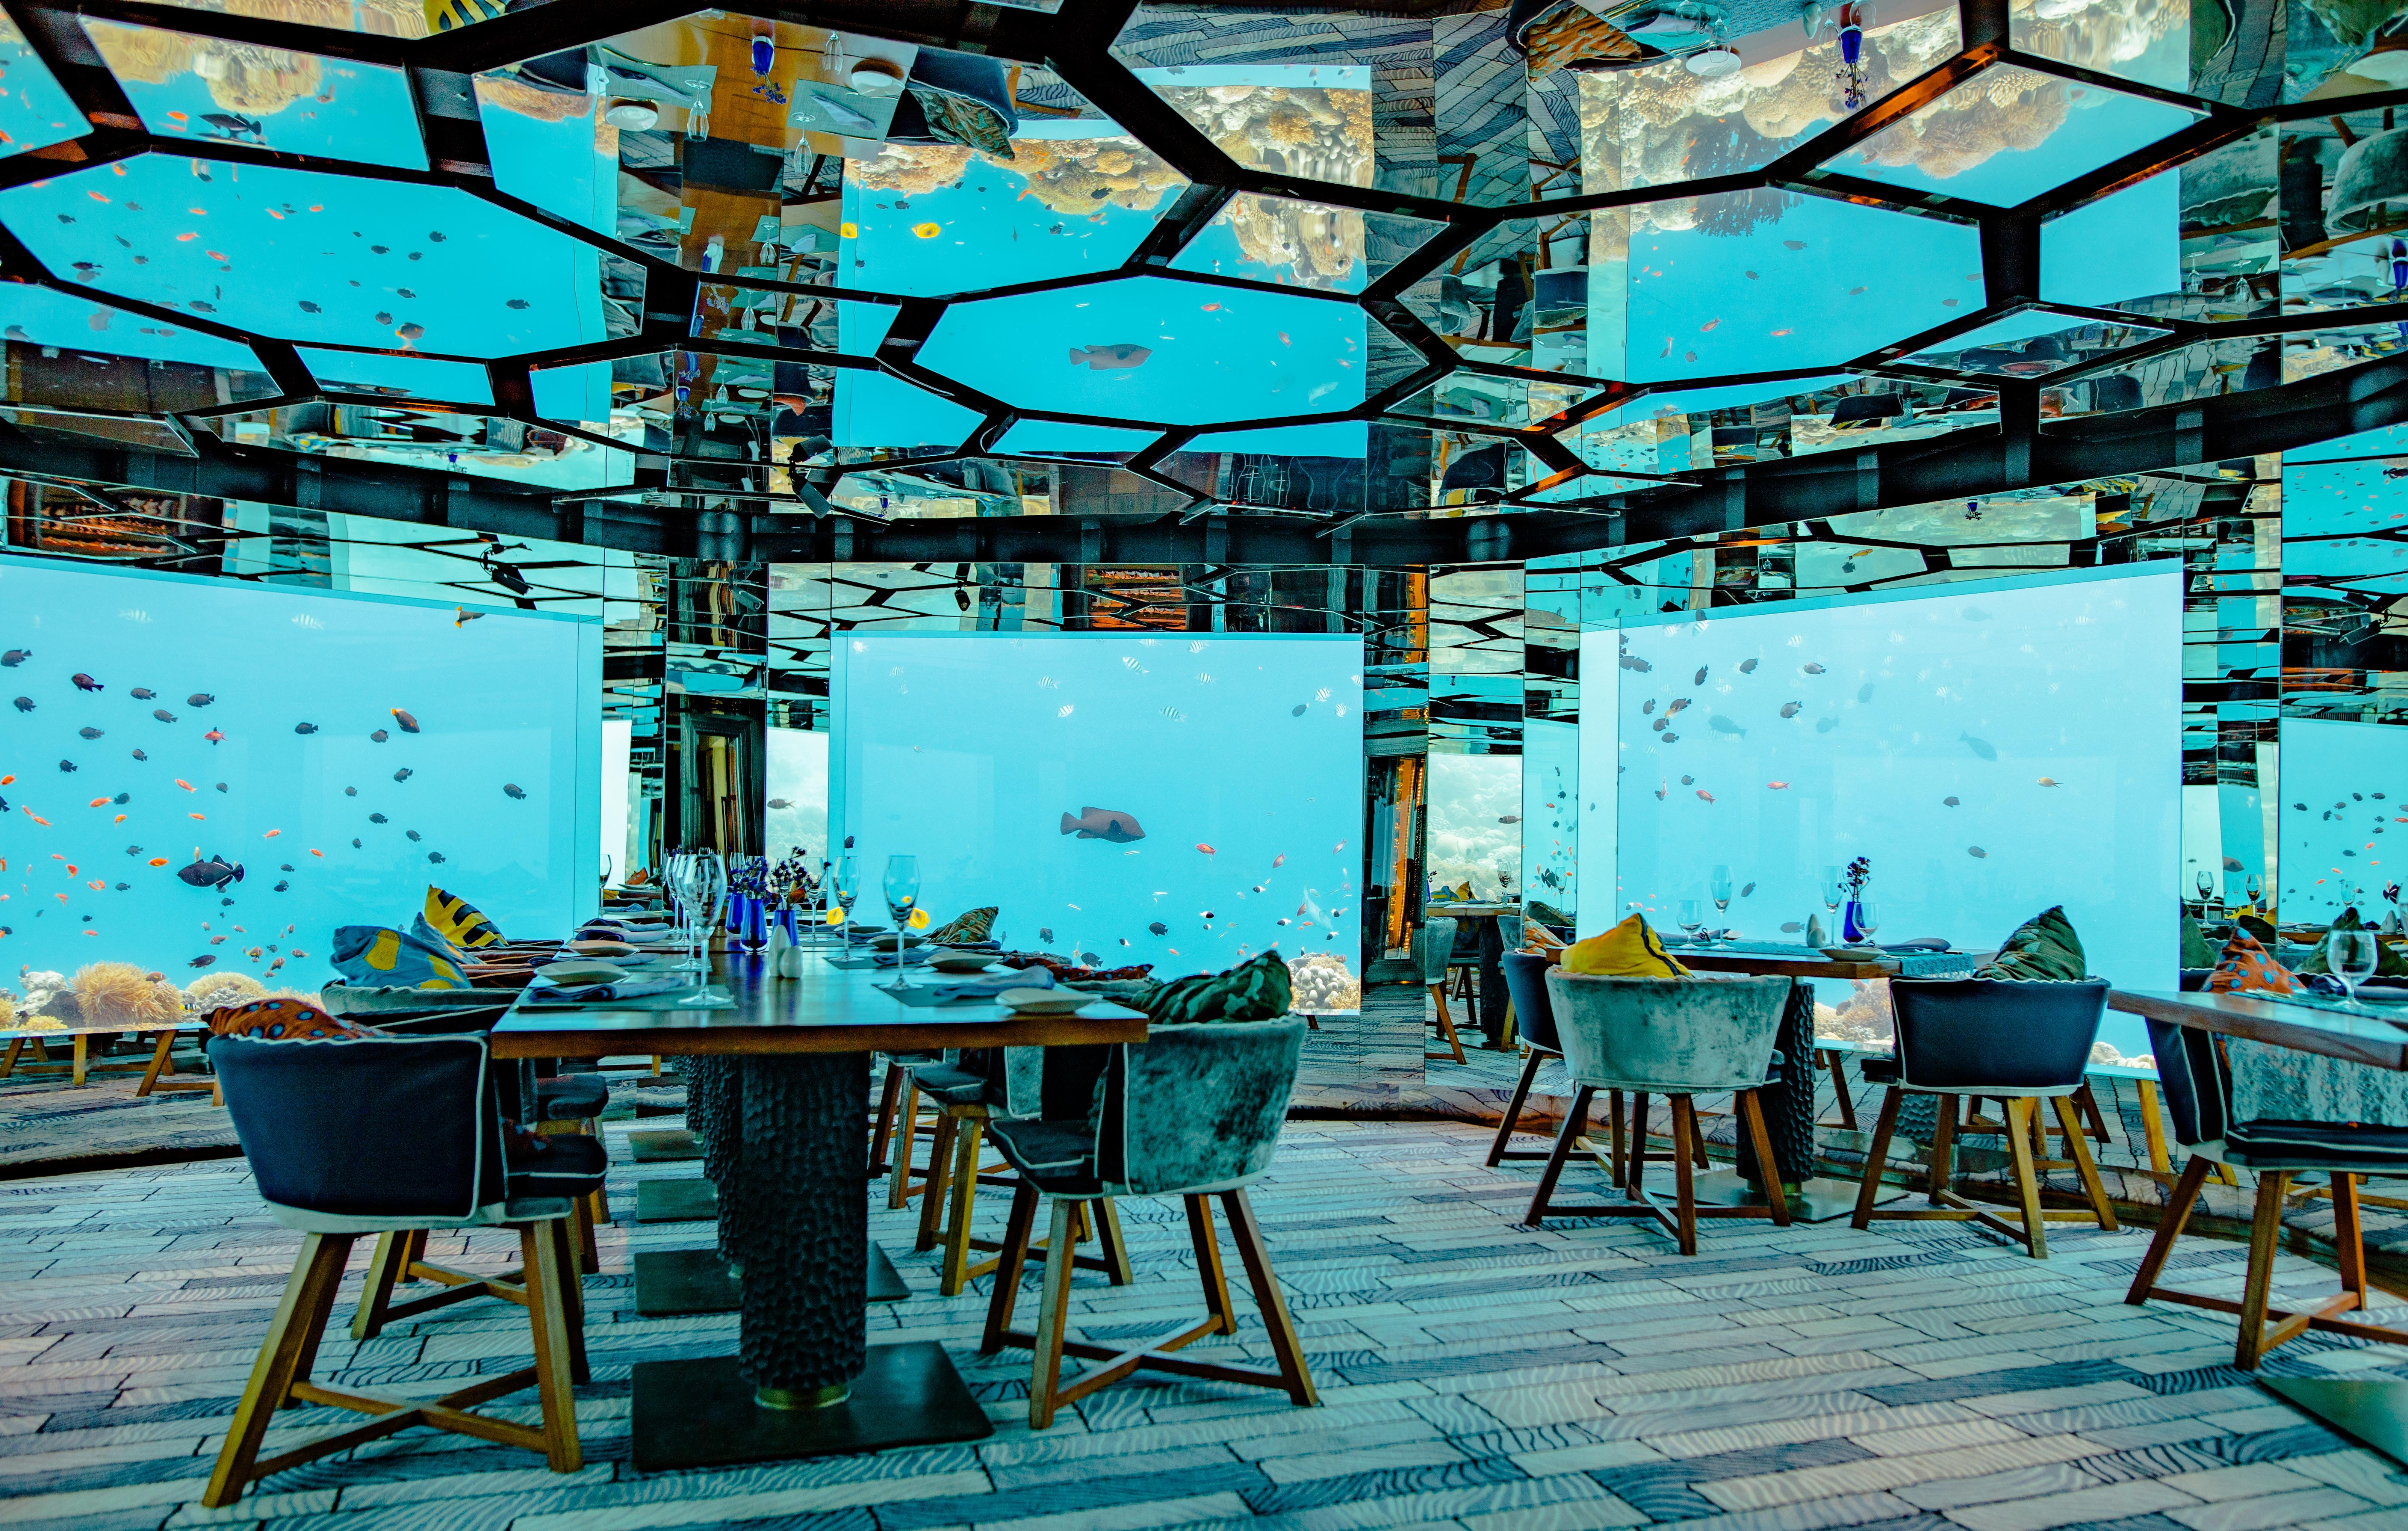 'Sea' underwater restaurant at the Anantara Kihavah Maldives Villas resort